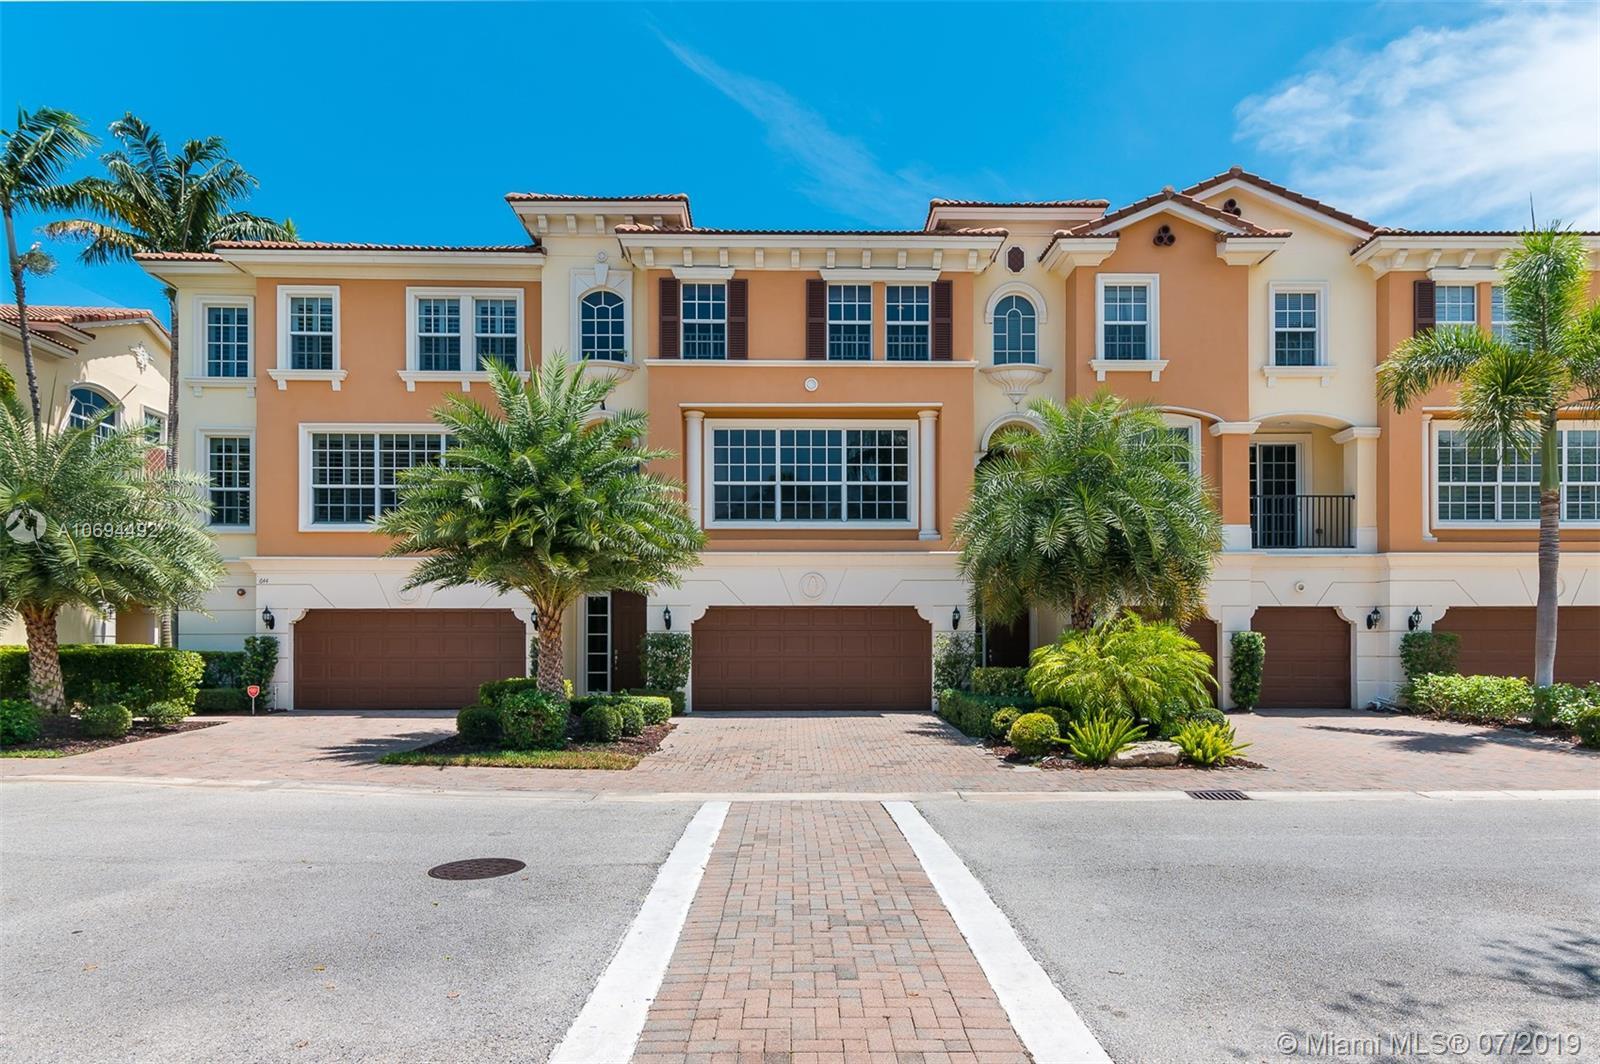 640 NE Francesca Ln, Boca Raton, FL 33487 - Boca Raton, FL real estate listing